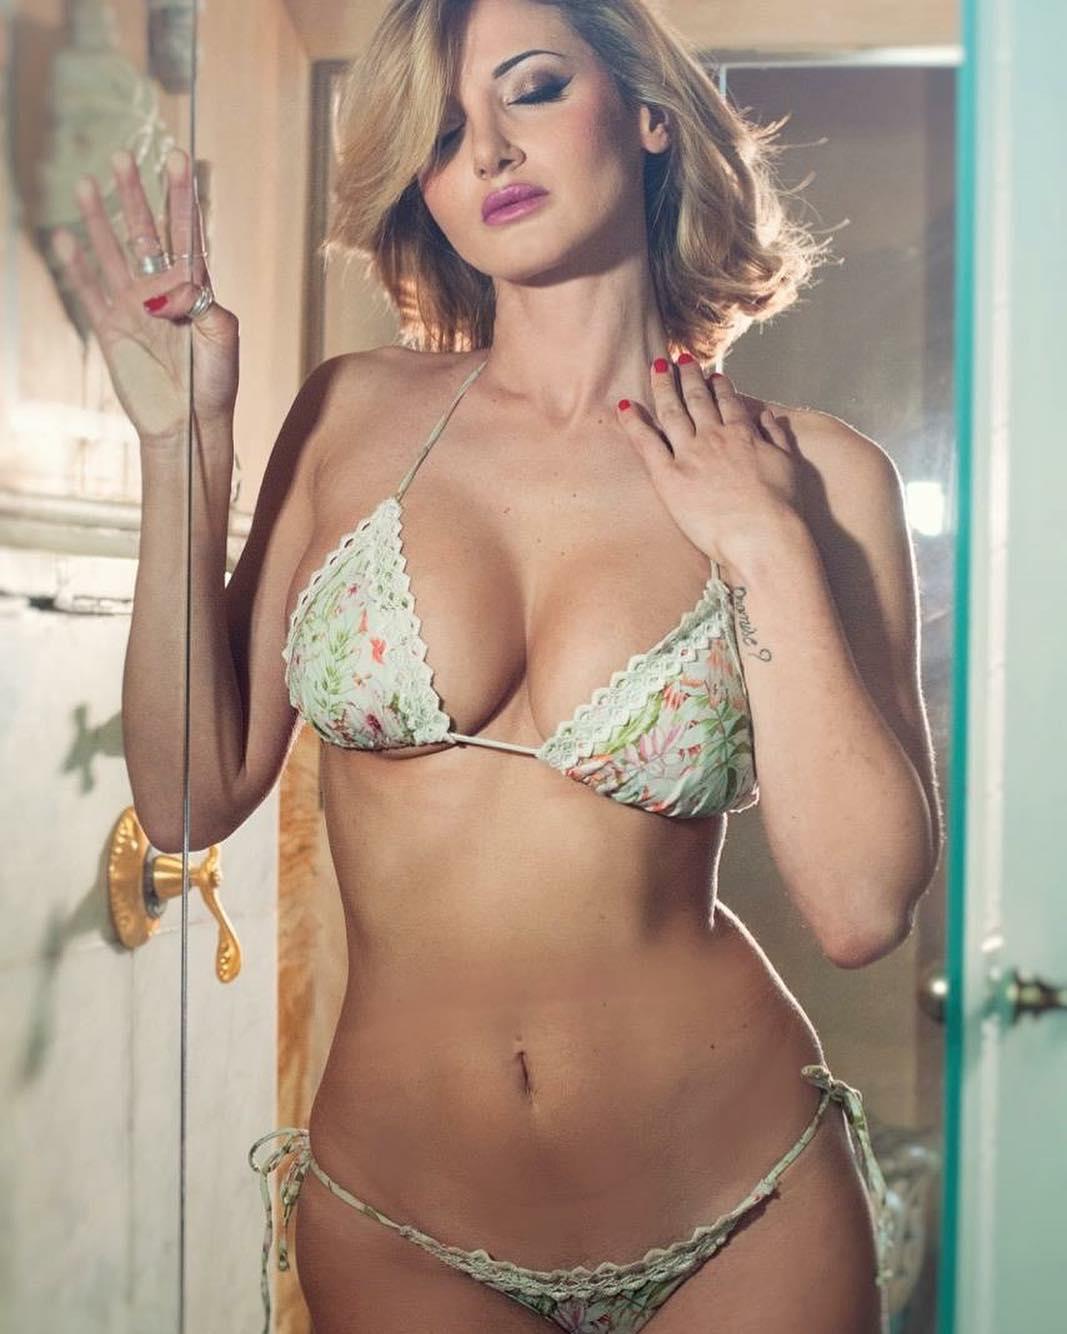 2019 Rosy Maggiulli nude photos 2019